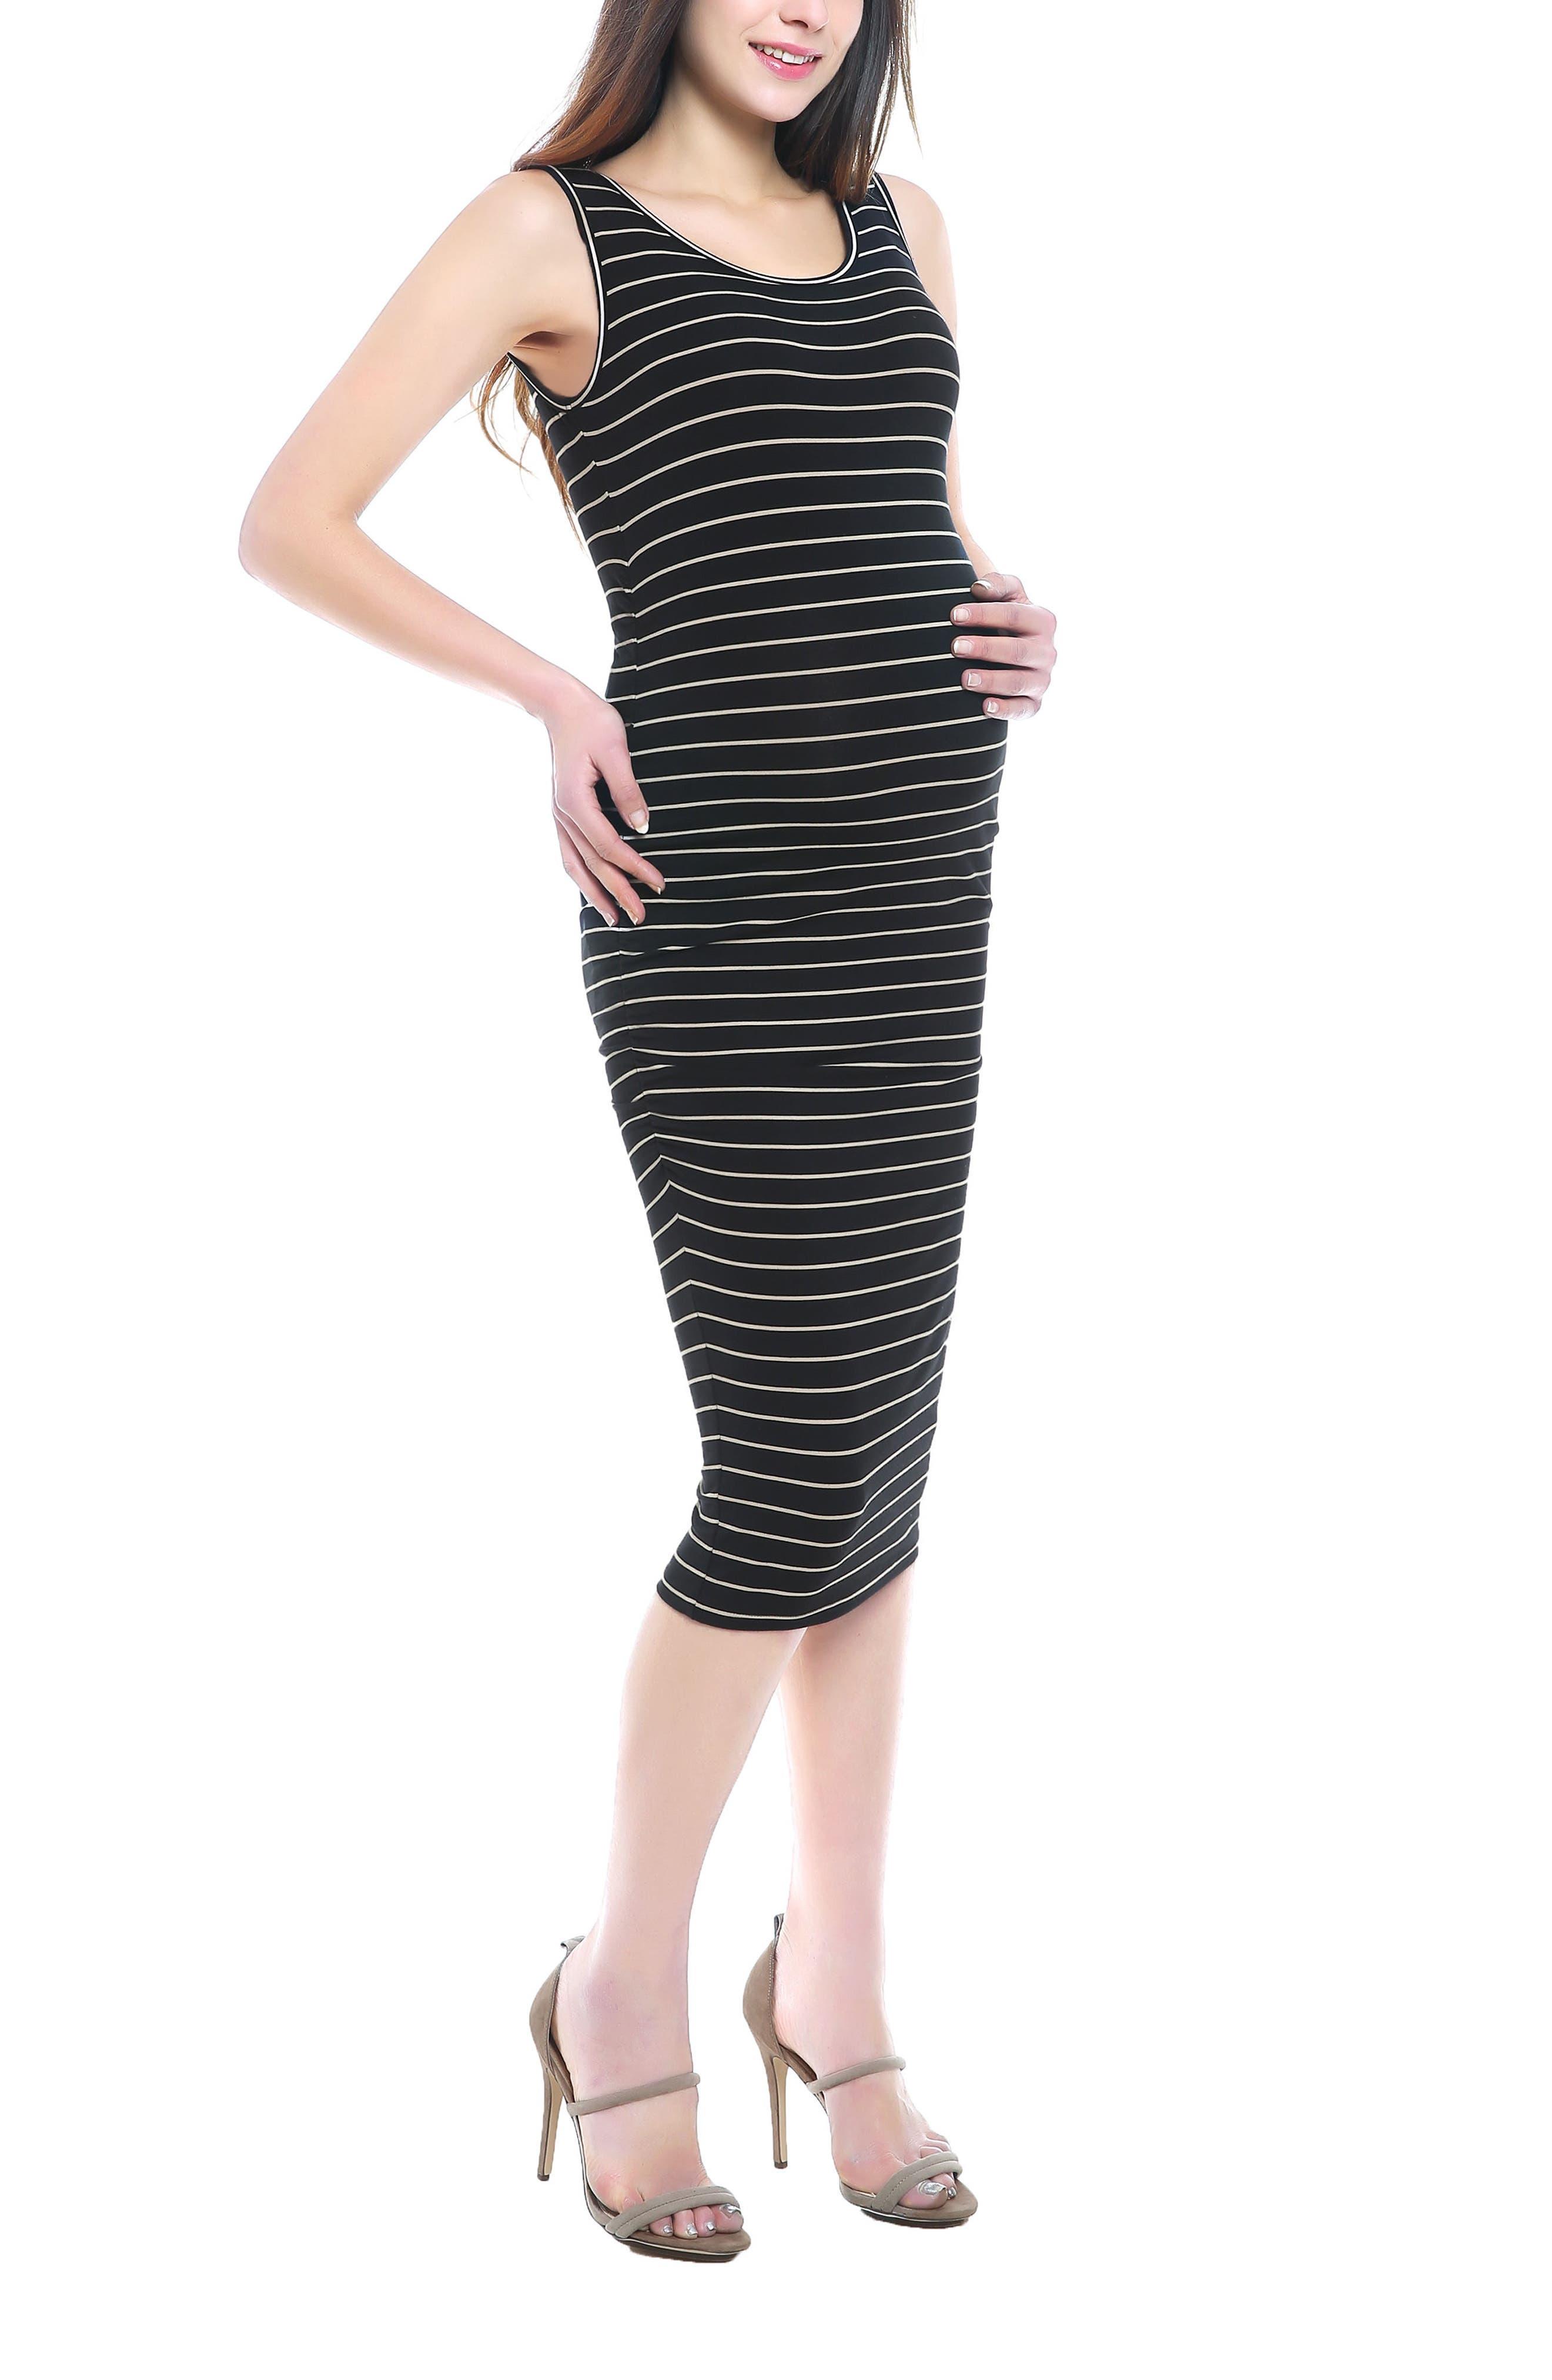 KIMI AND KAI, Tobi Stripe Maternity Dress, Alternate thumbnail 4, color, BLACK/ BEIGE